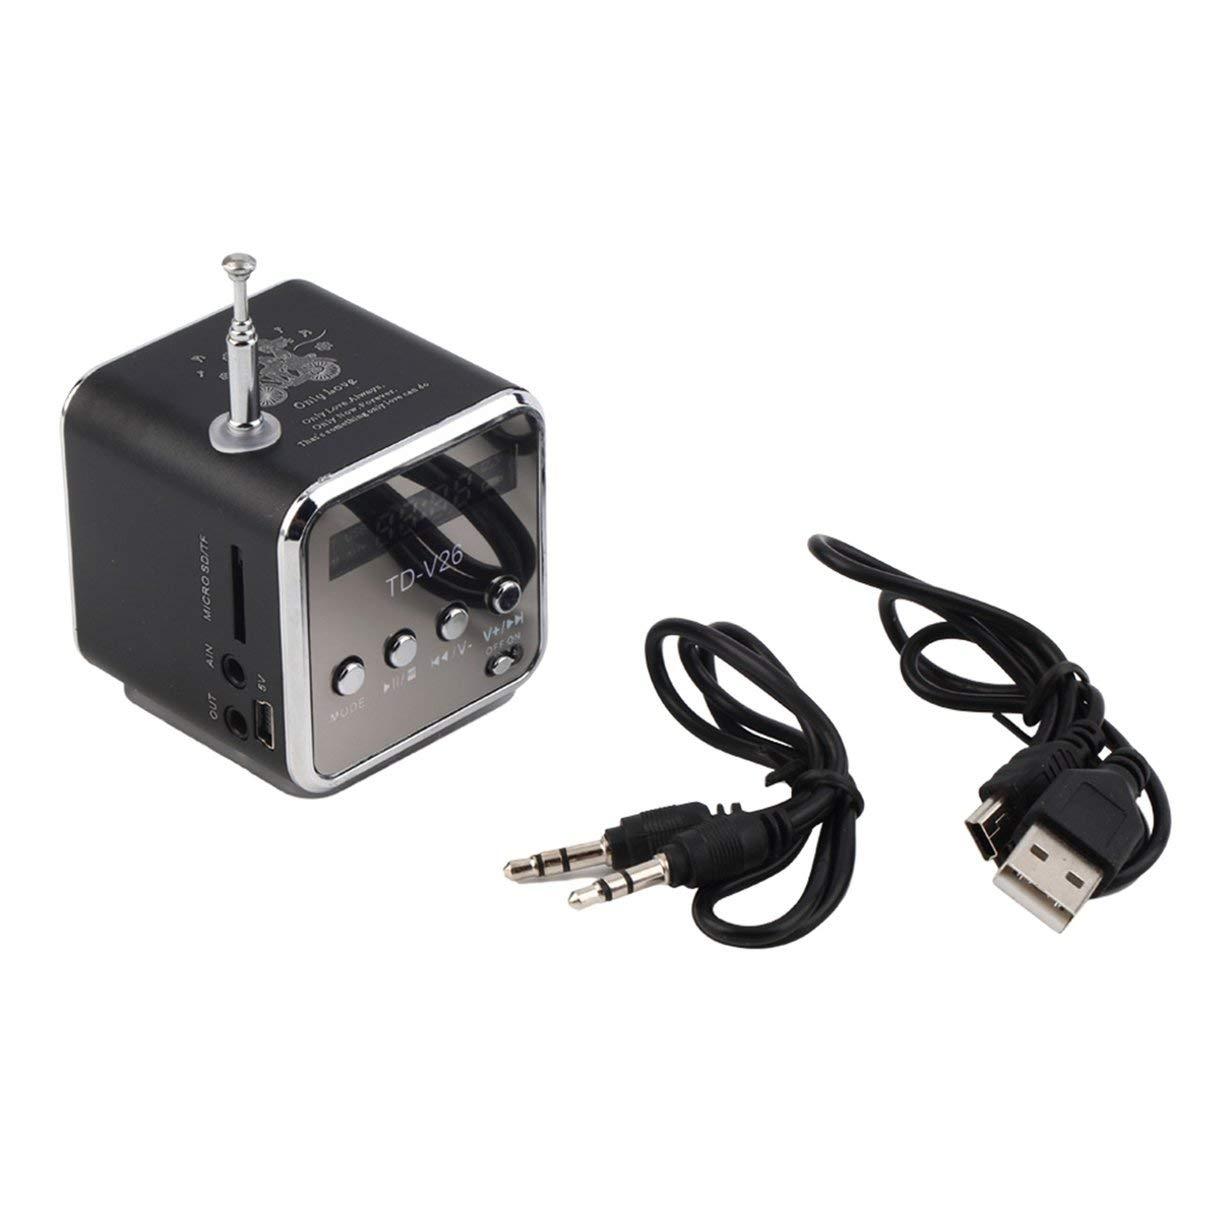 Minilautsprecher, Minilautsprecher, beweglicher Mikro-TF USB-Minilautsprecher Musik-Spieler Beweglicher FM-Radio-Stereotelefon-Laptop MP3-MP4 Spieler-Minilautsprecher Wafalano